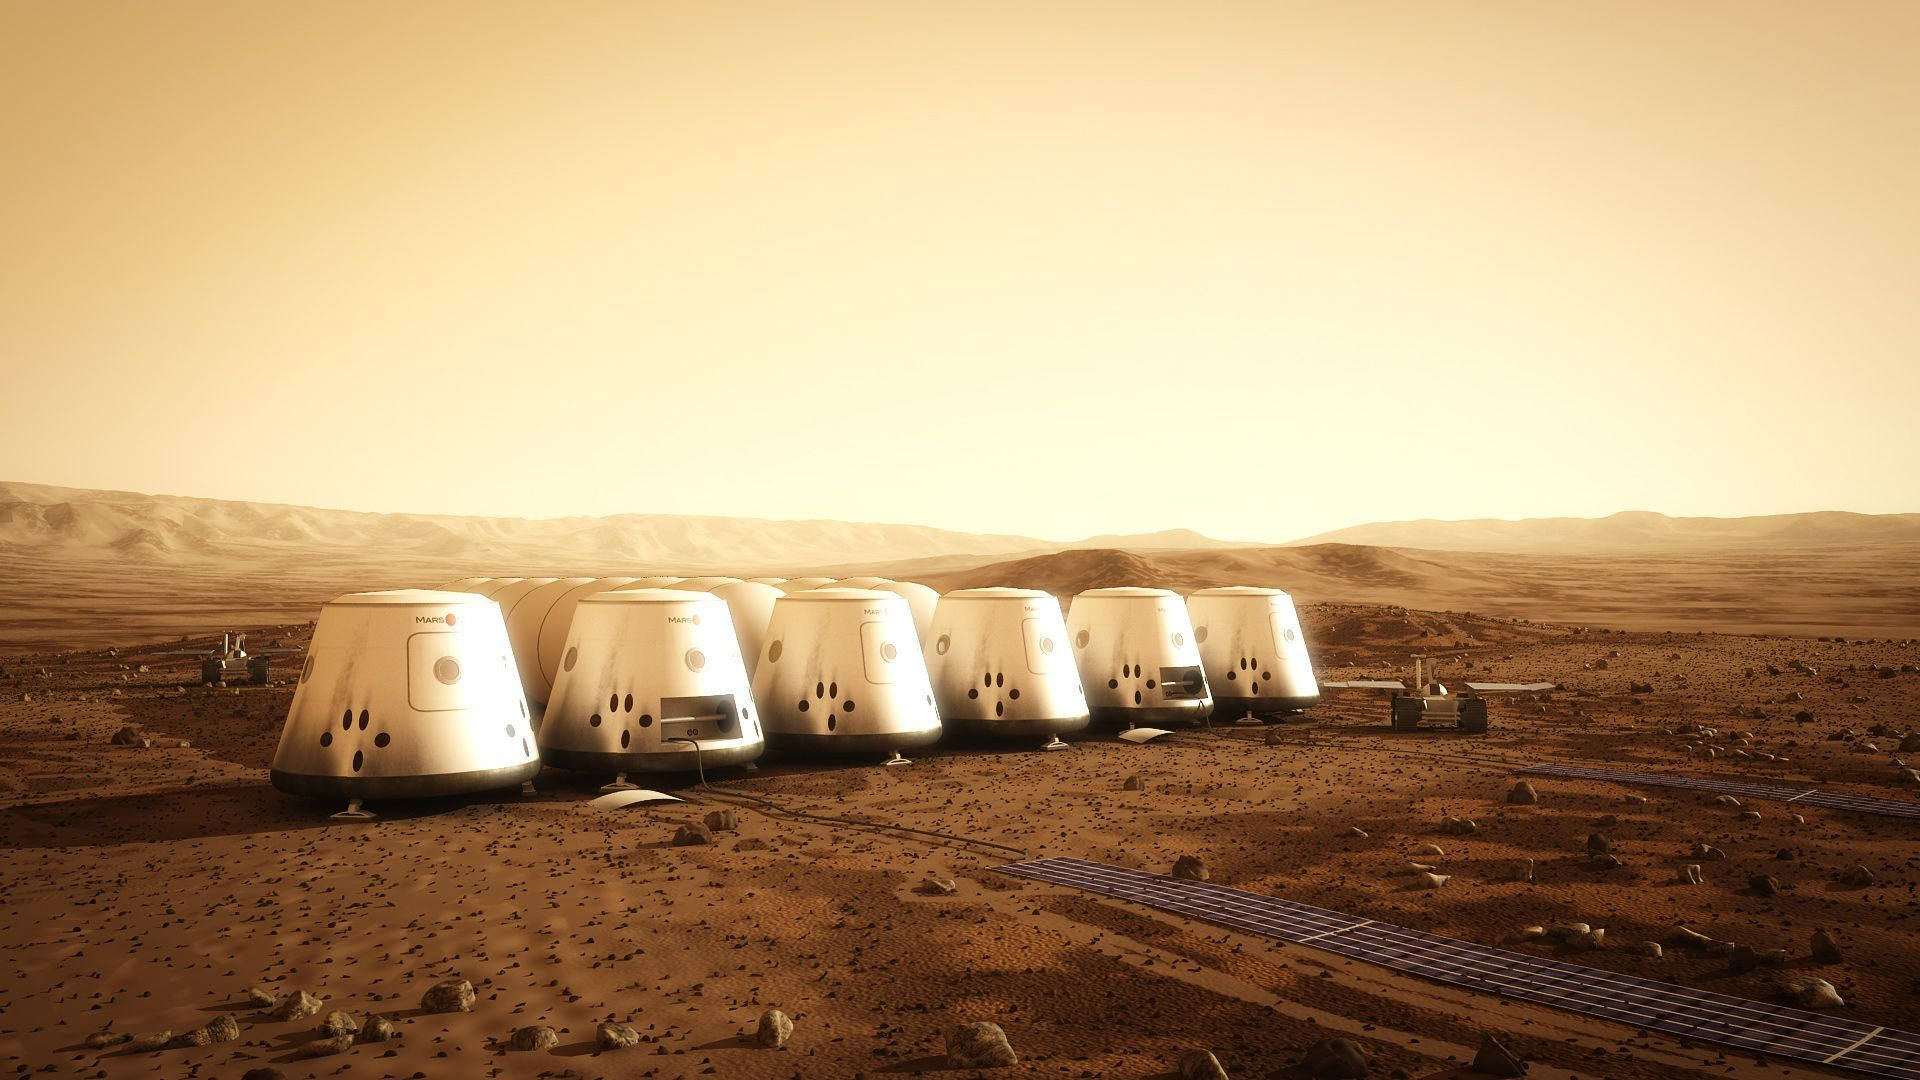 travel to mars 2023 - photo #16